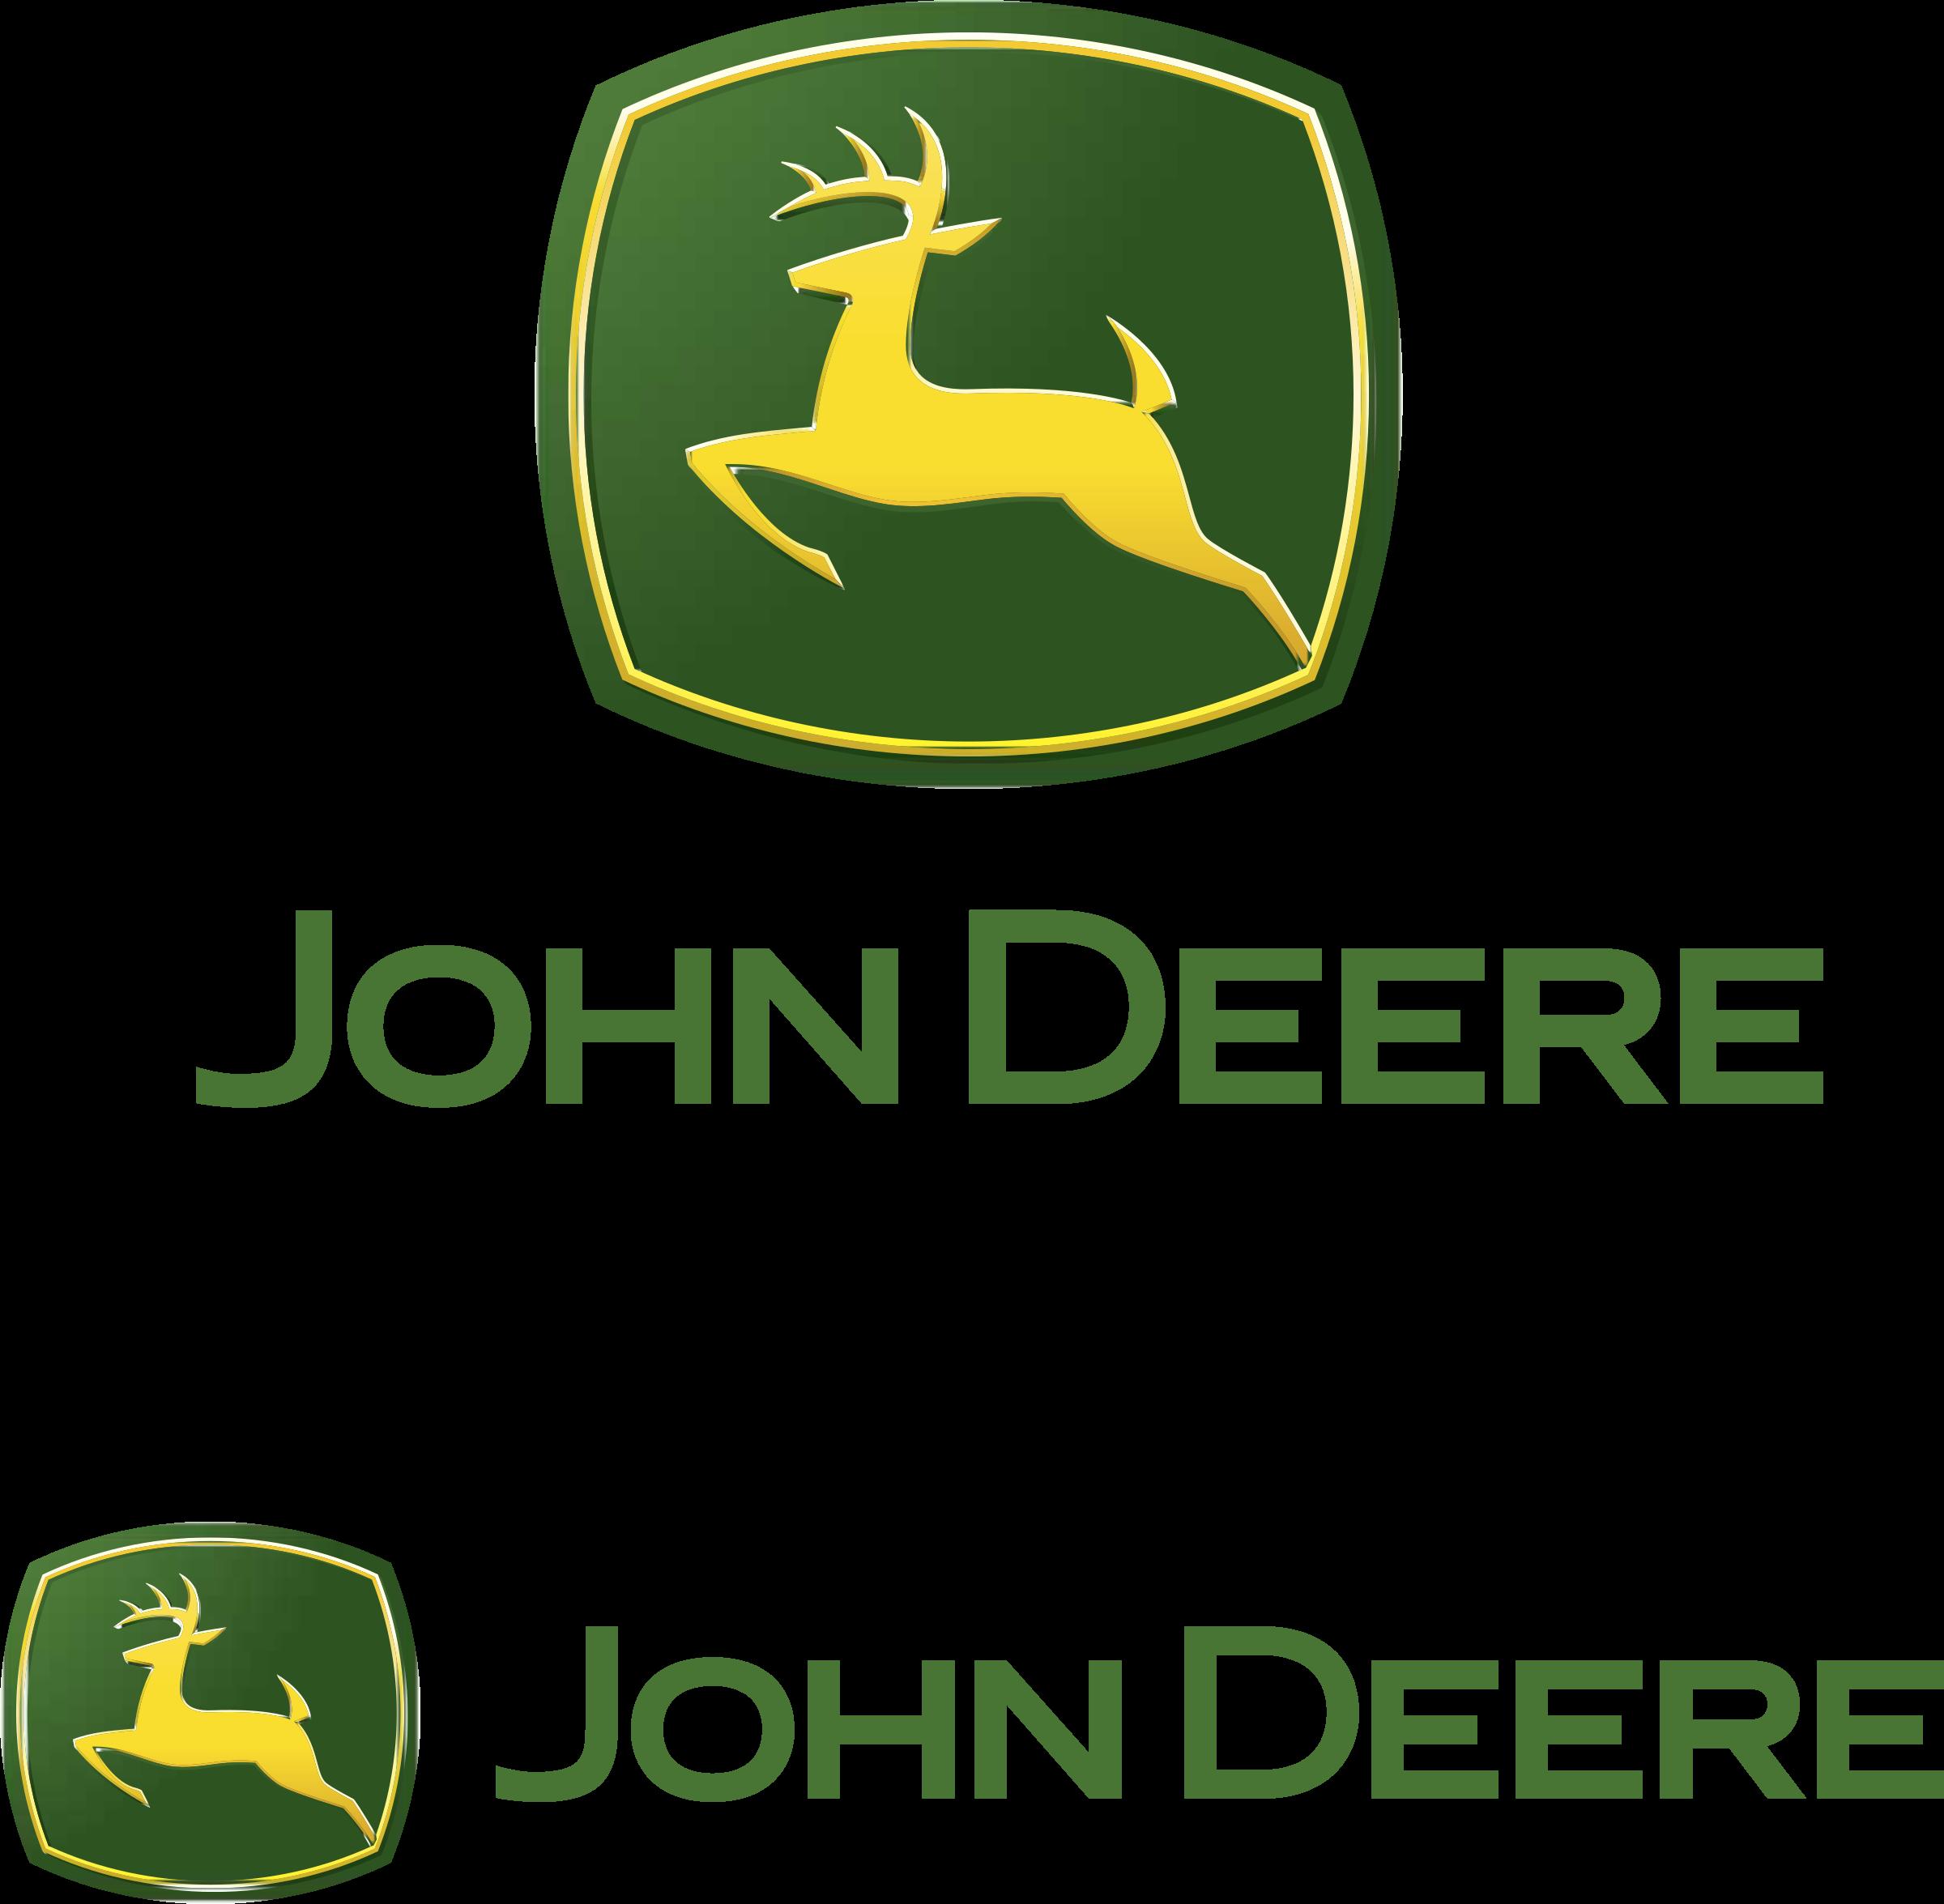 john deere logo png transparent svg vector freebie supply rh freebiesupply com john deere logos to download john deere logos for sale